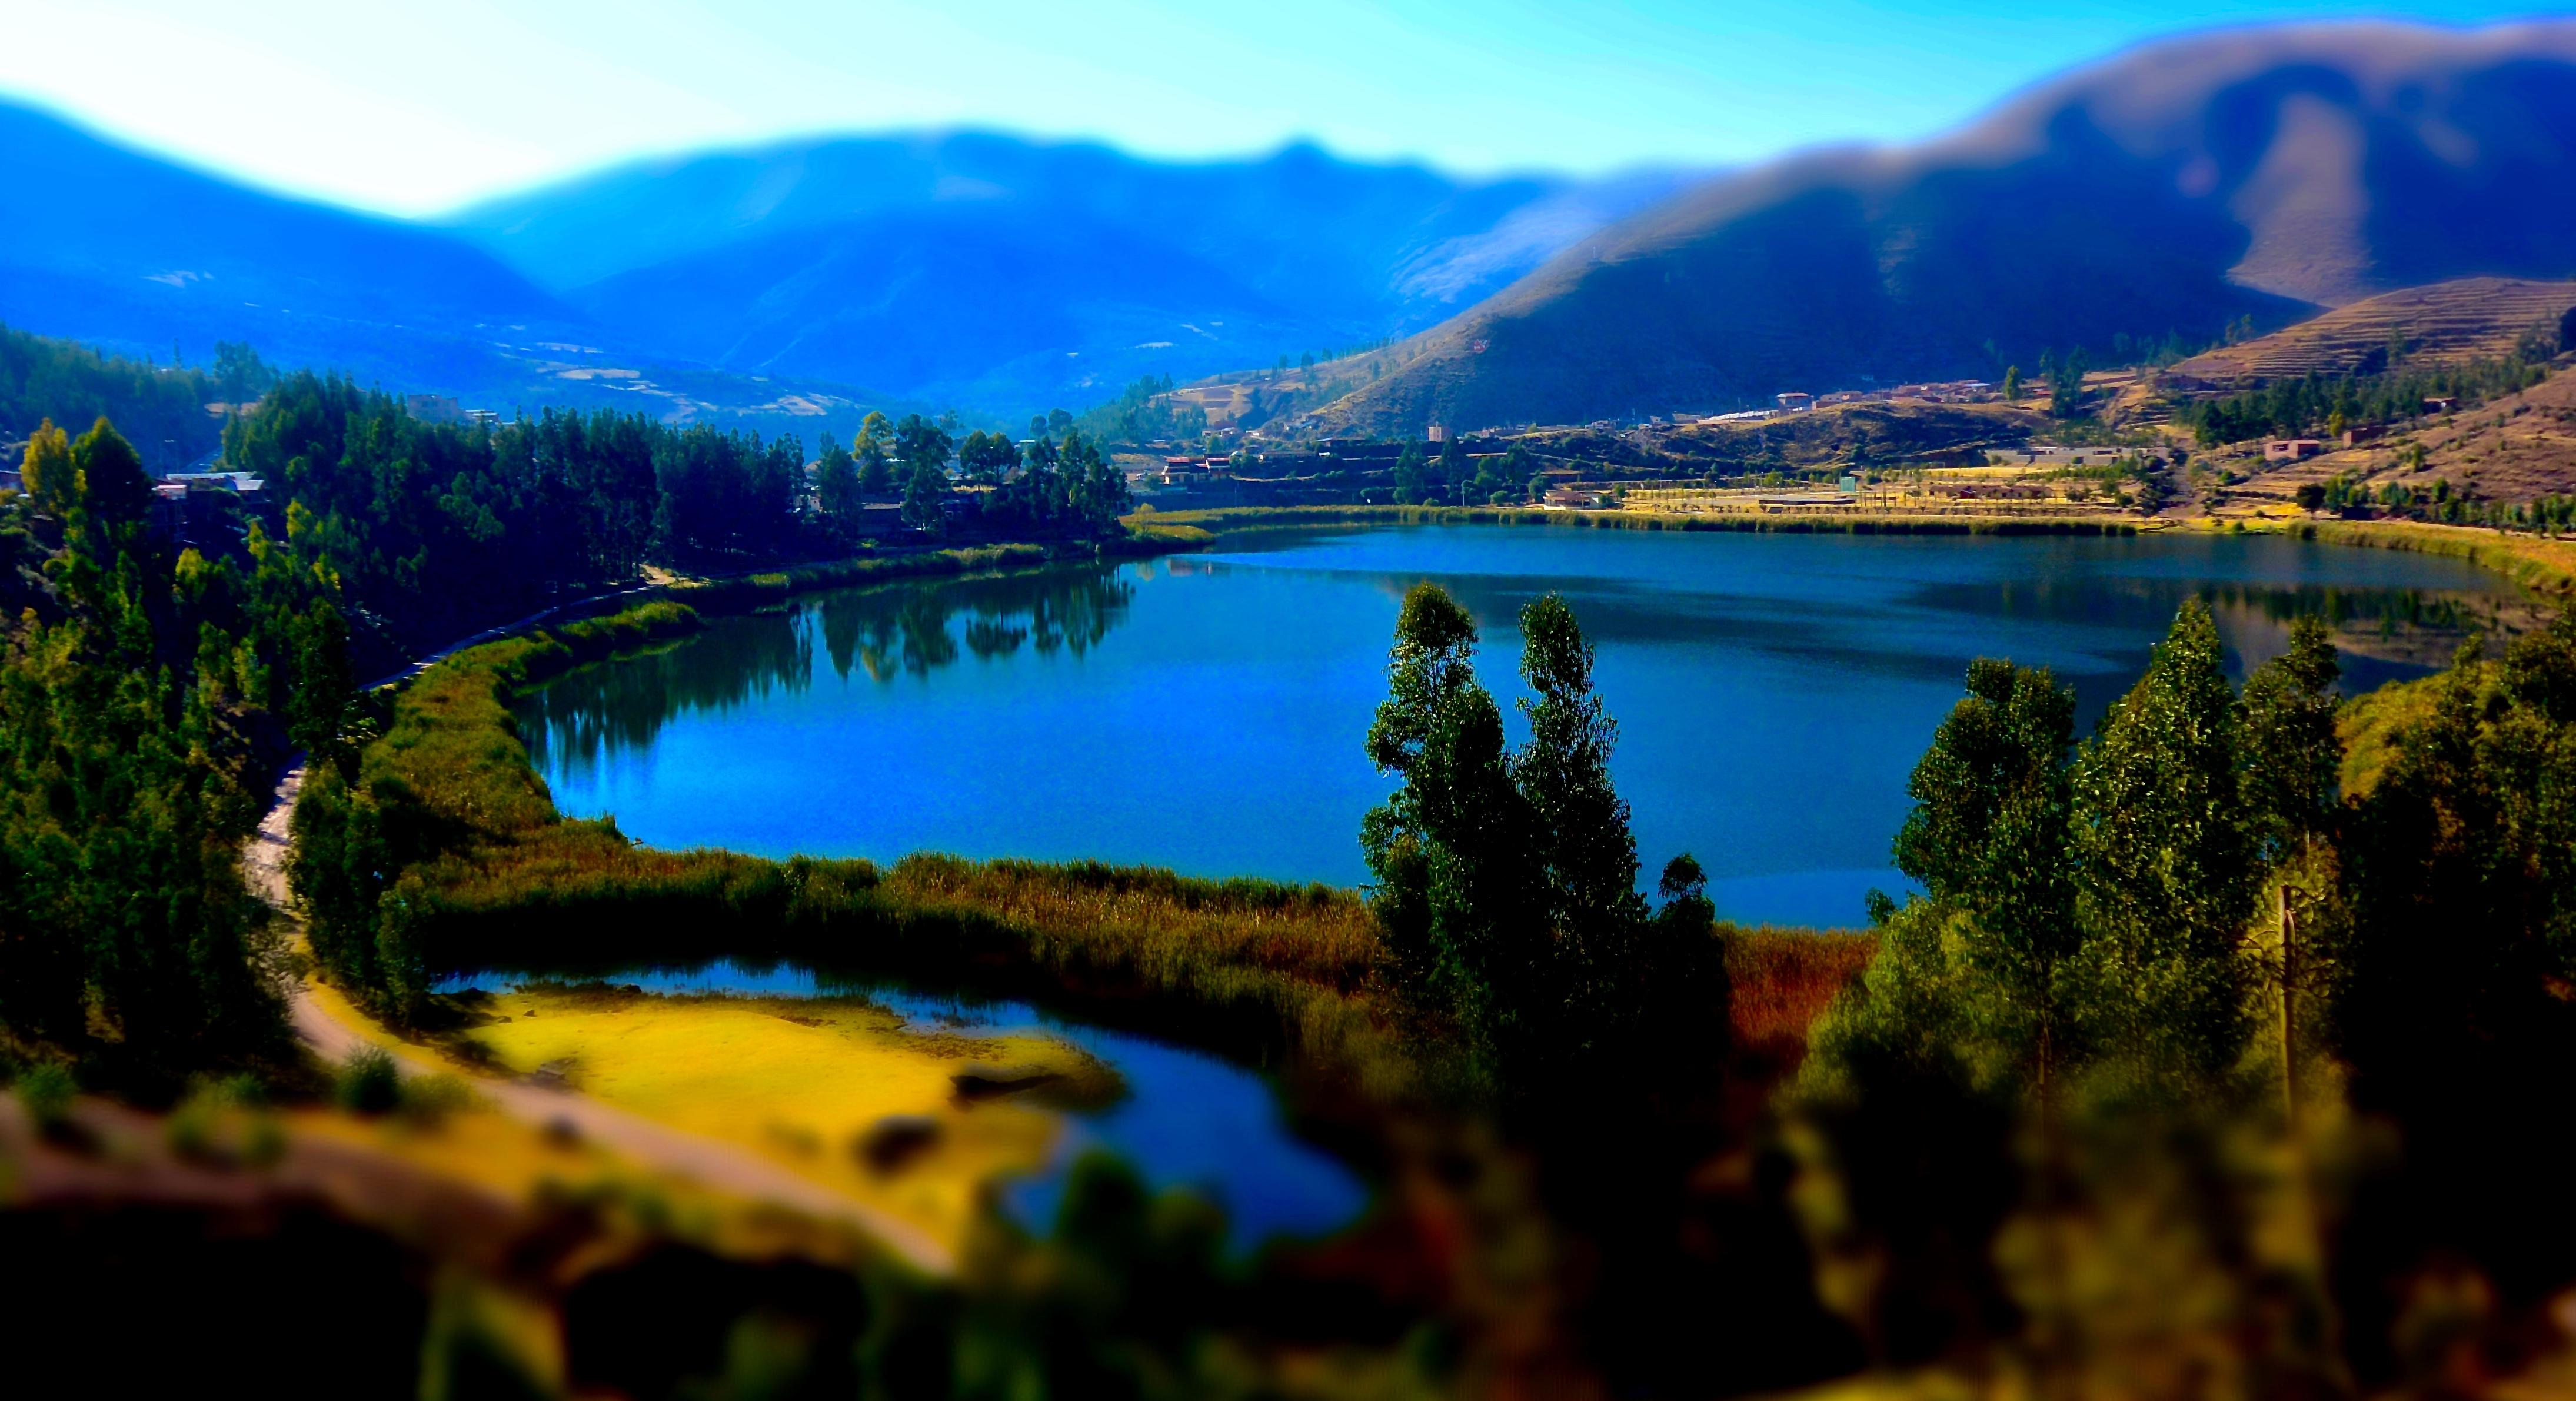 Laguna de Urcos